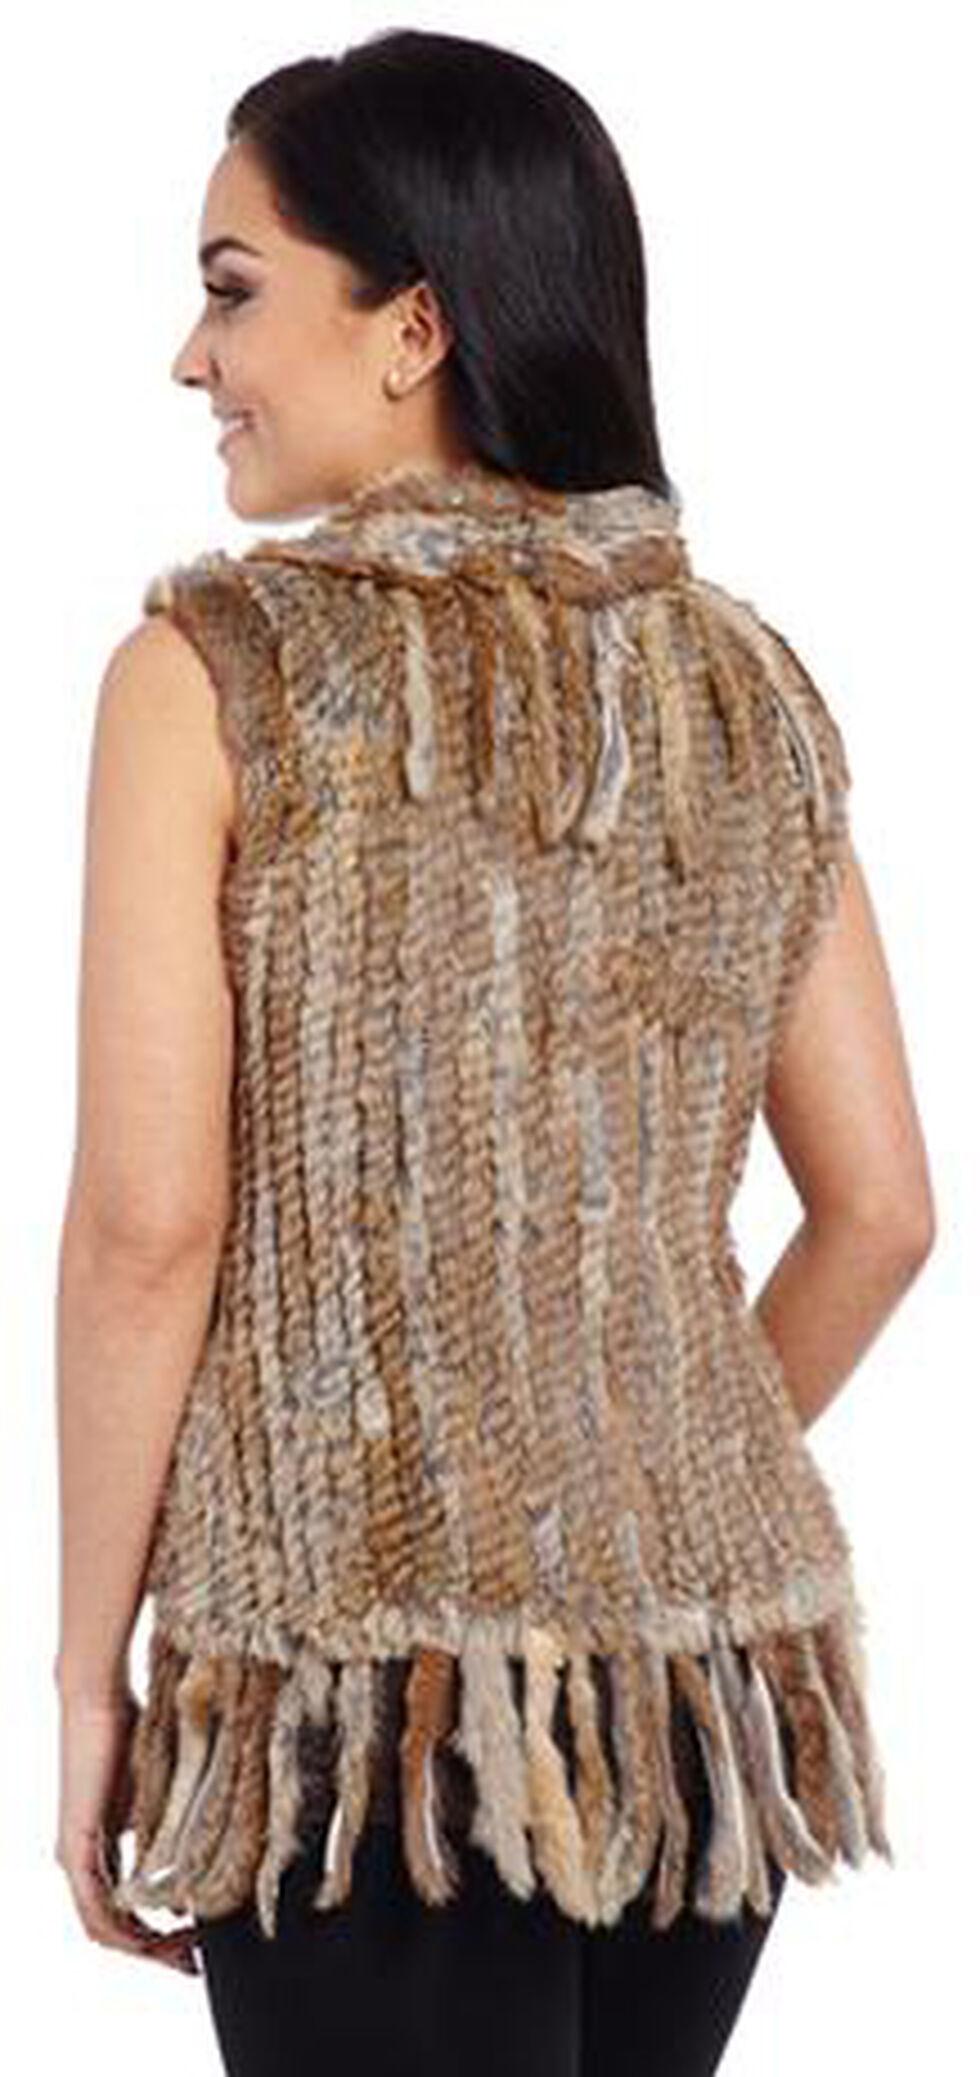 Cripple Creek Women's Faux Rabbit Fur Vest, Tan, hi-res